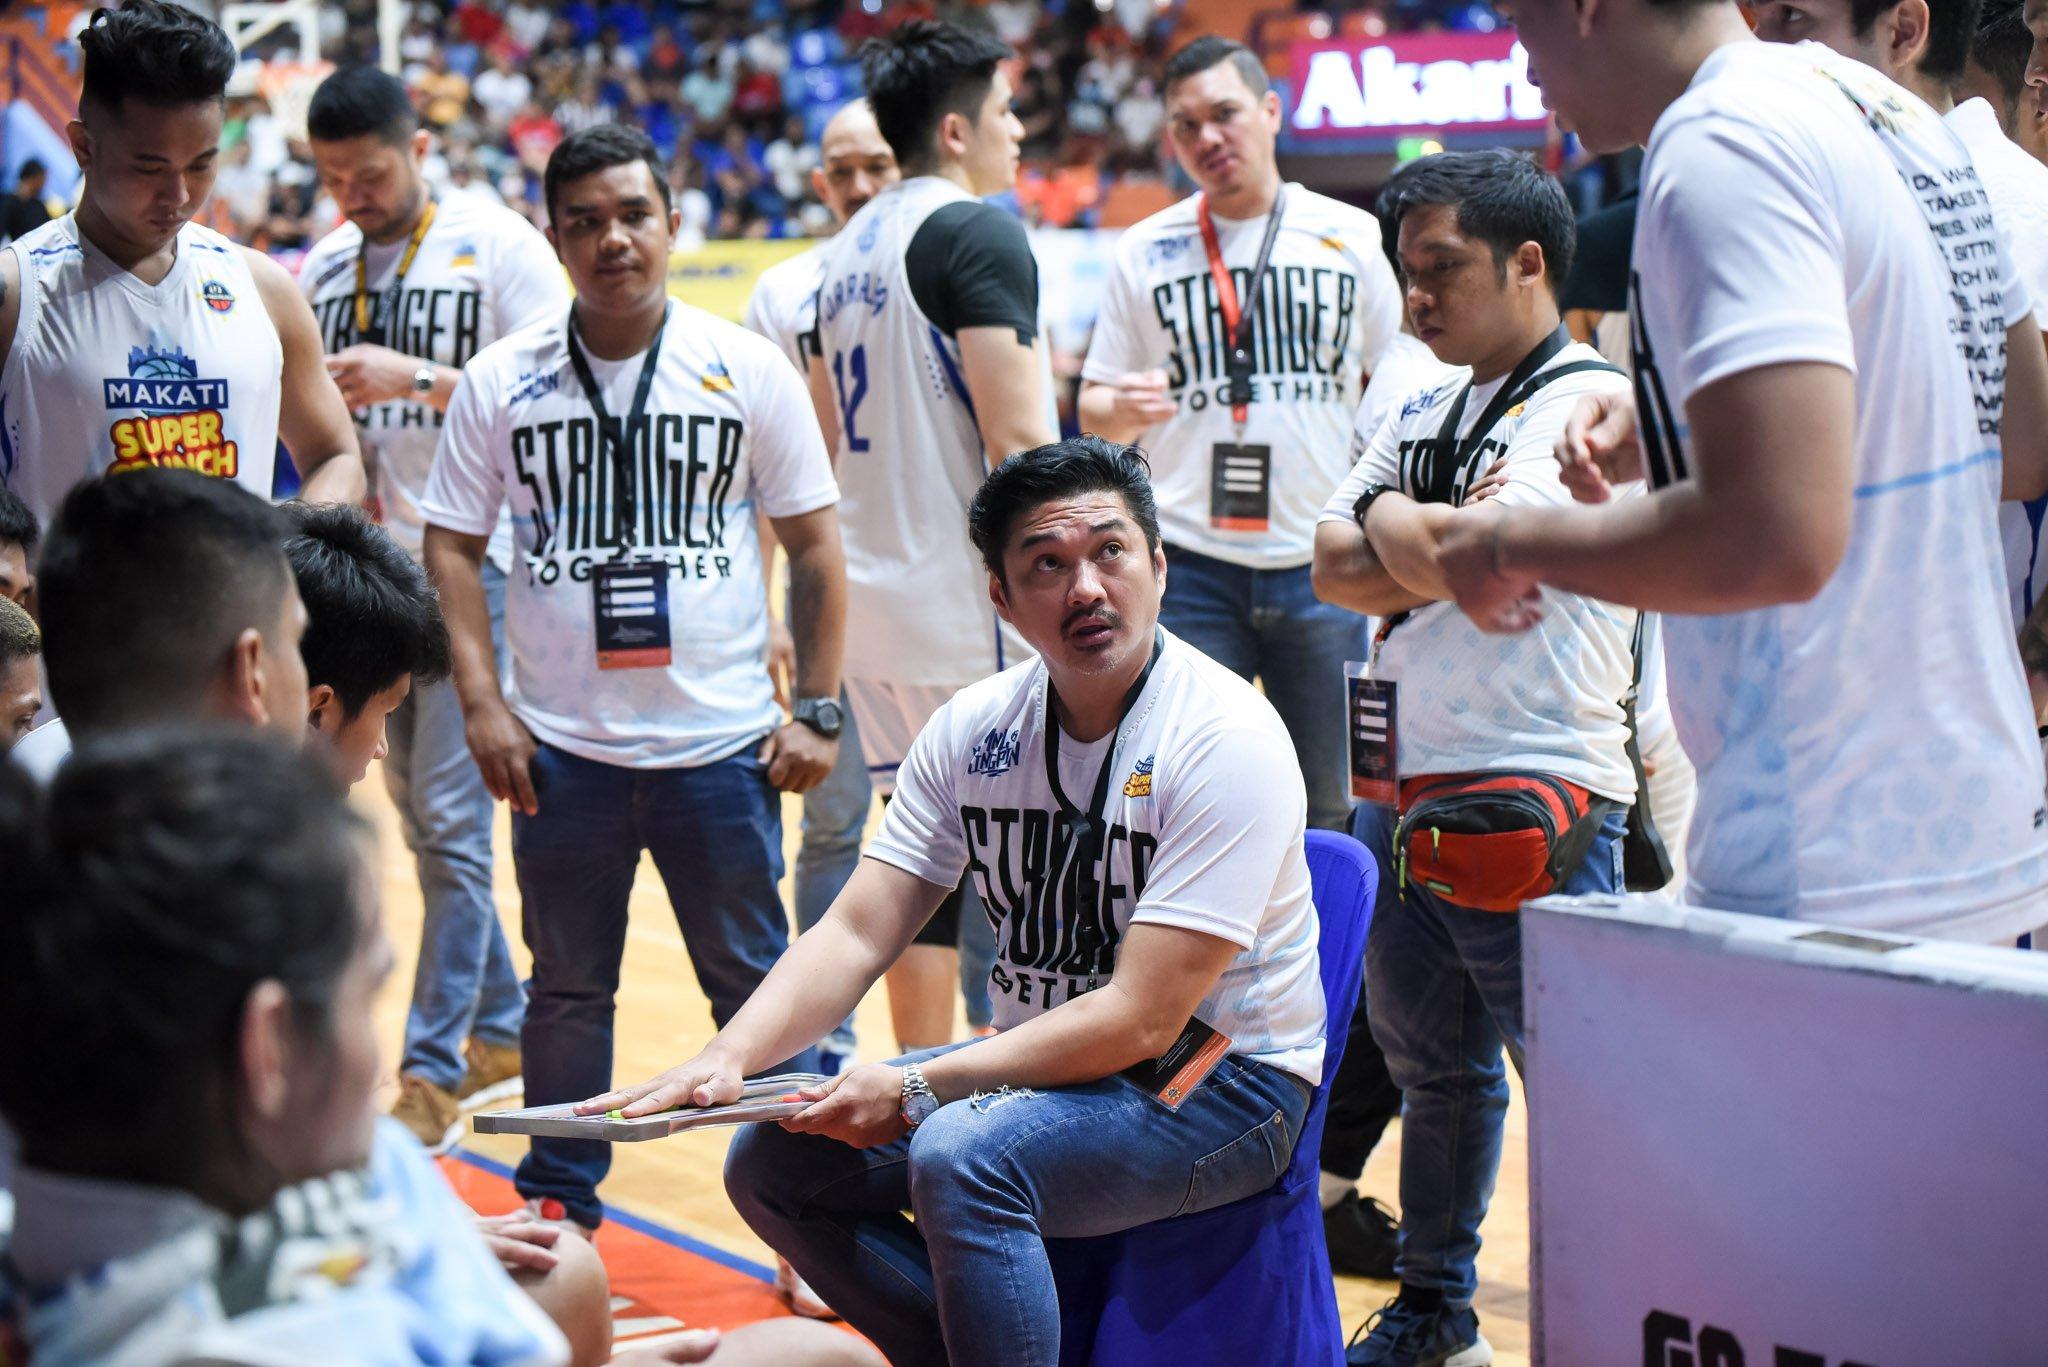 Tiebreaker Times Makati coach Beaujing Acot gives back through PYD Cares Basketball MPBL News  Rhuel Acot Makati Super Crunch Coronavirus Pandemic 2019-20 MPBL Lakan Cup